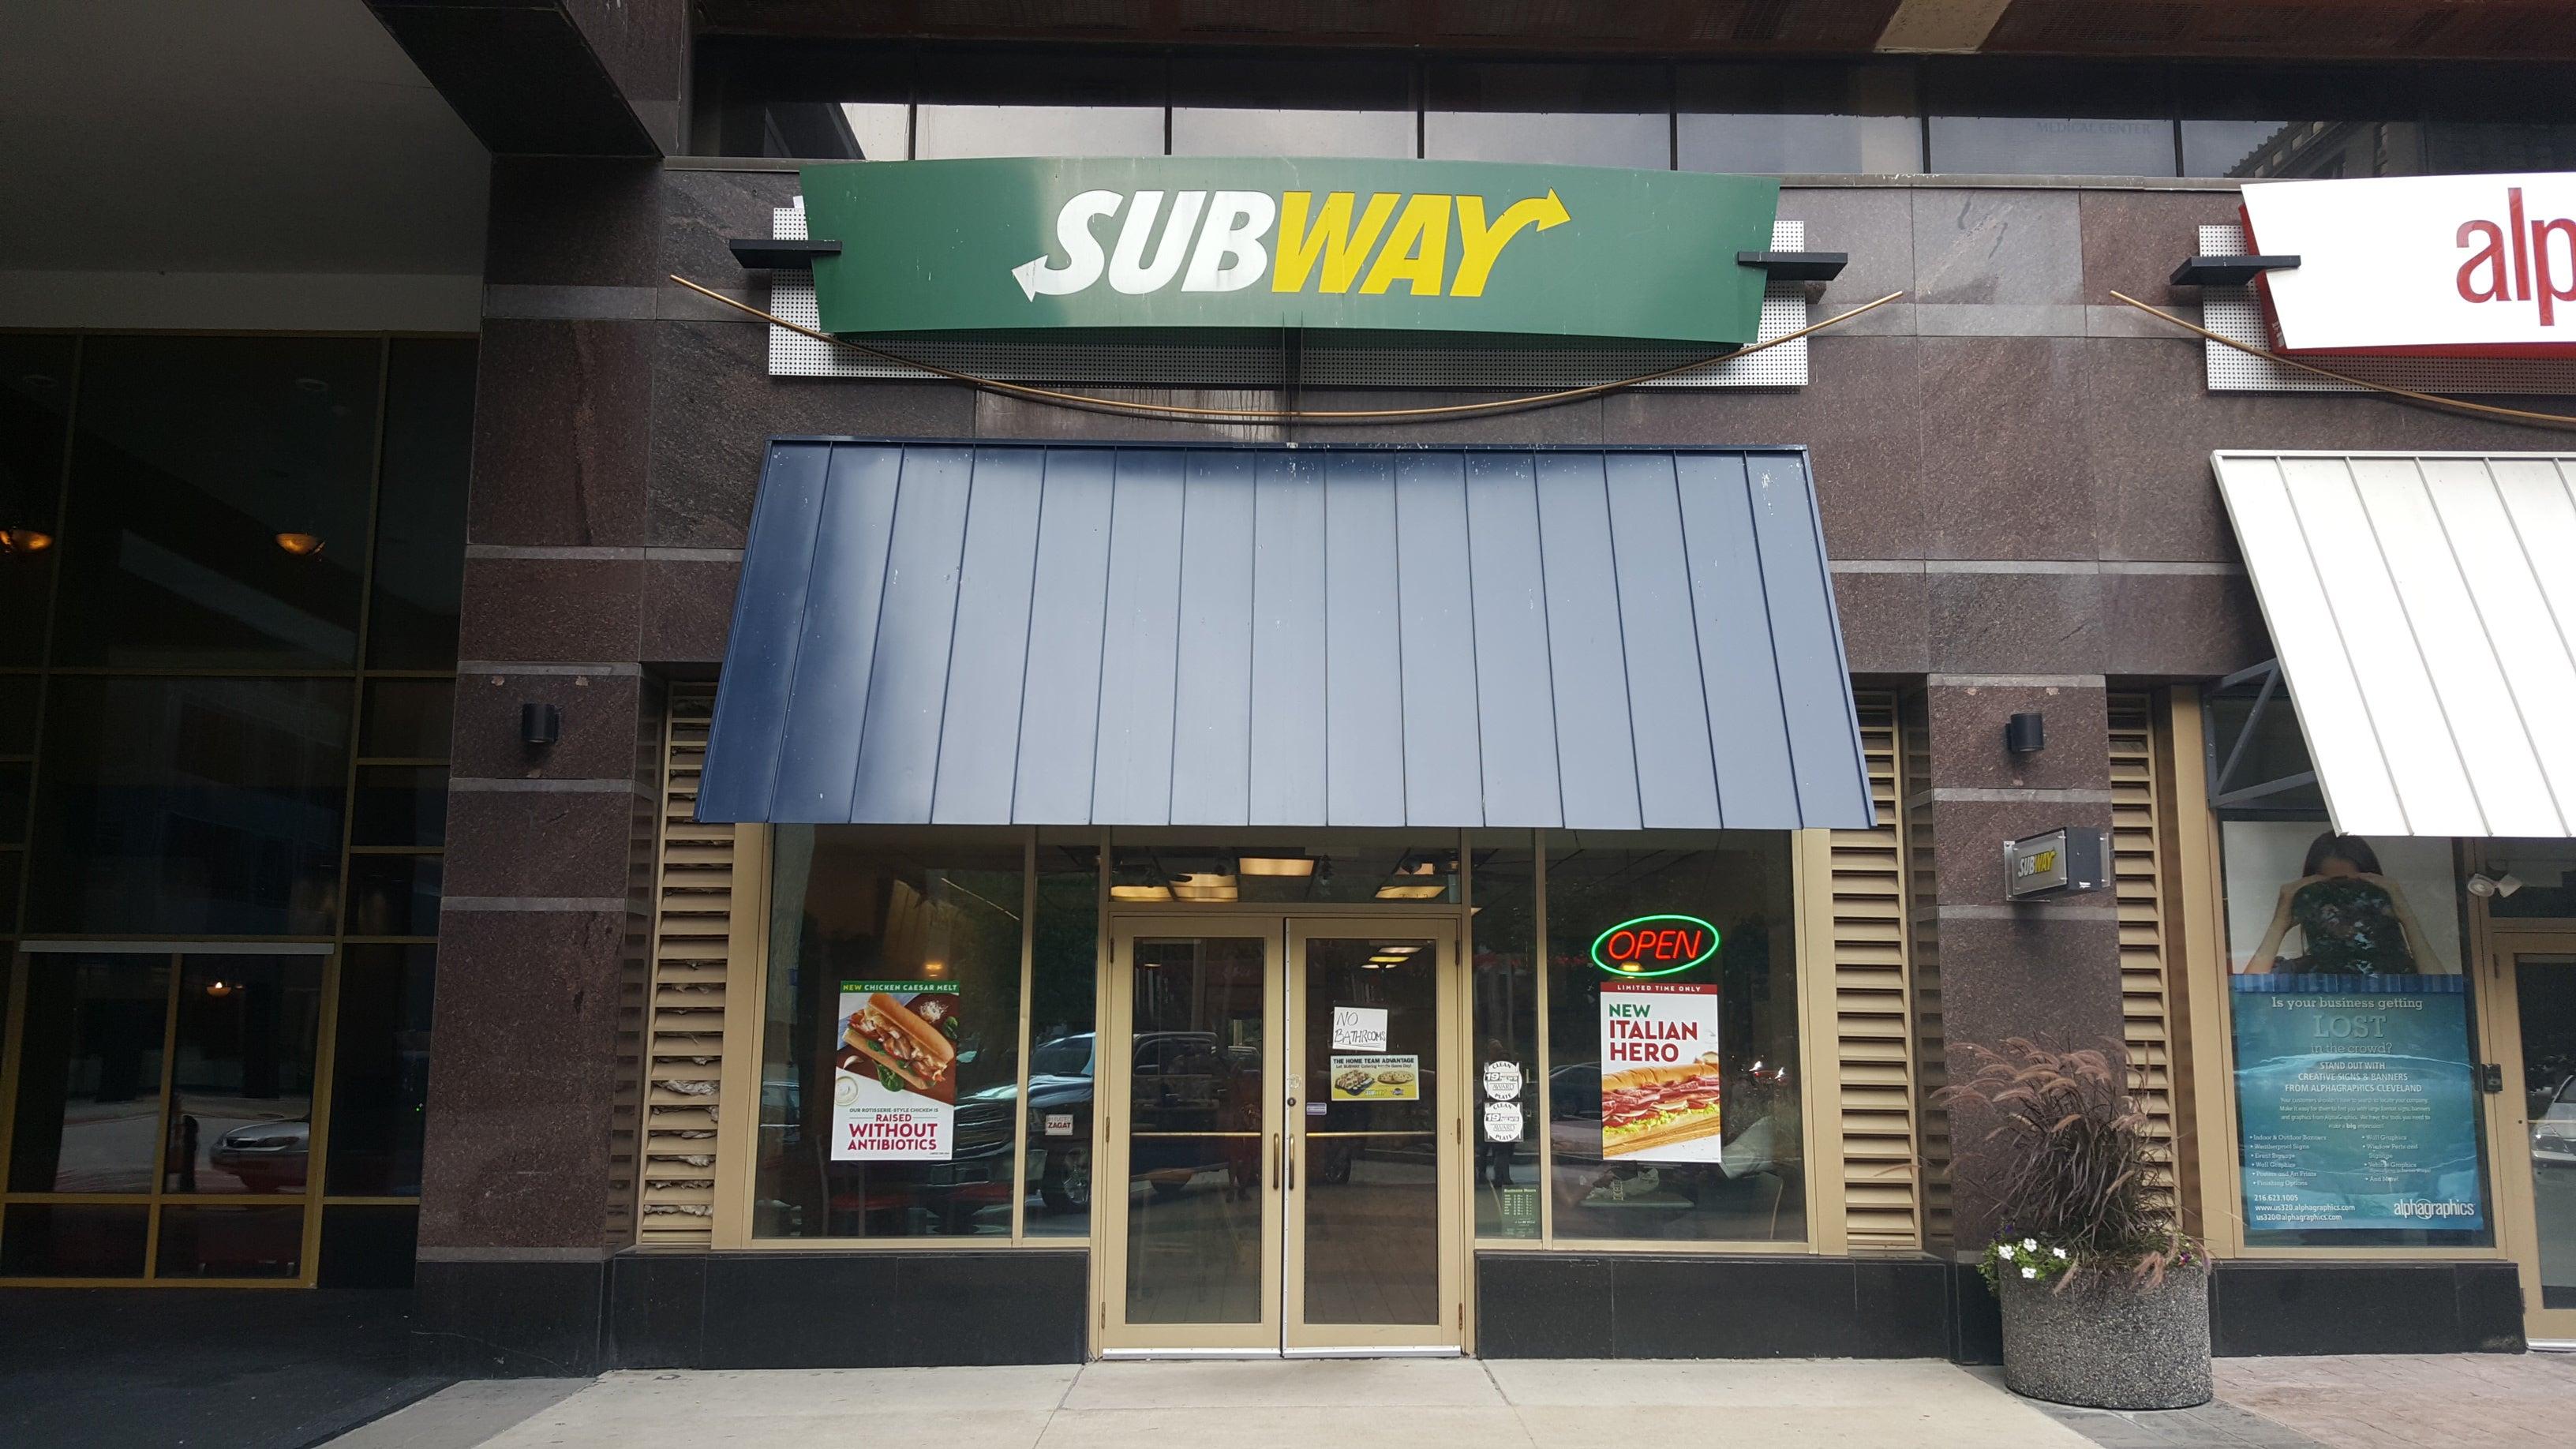 Subway Sandwiches,dinner,lunch,salt,subs